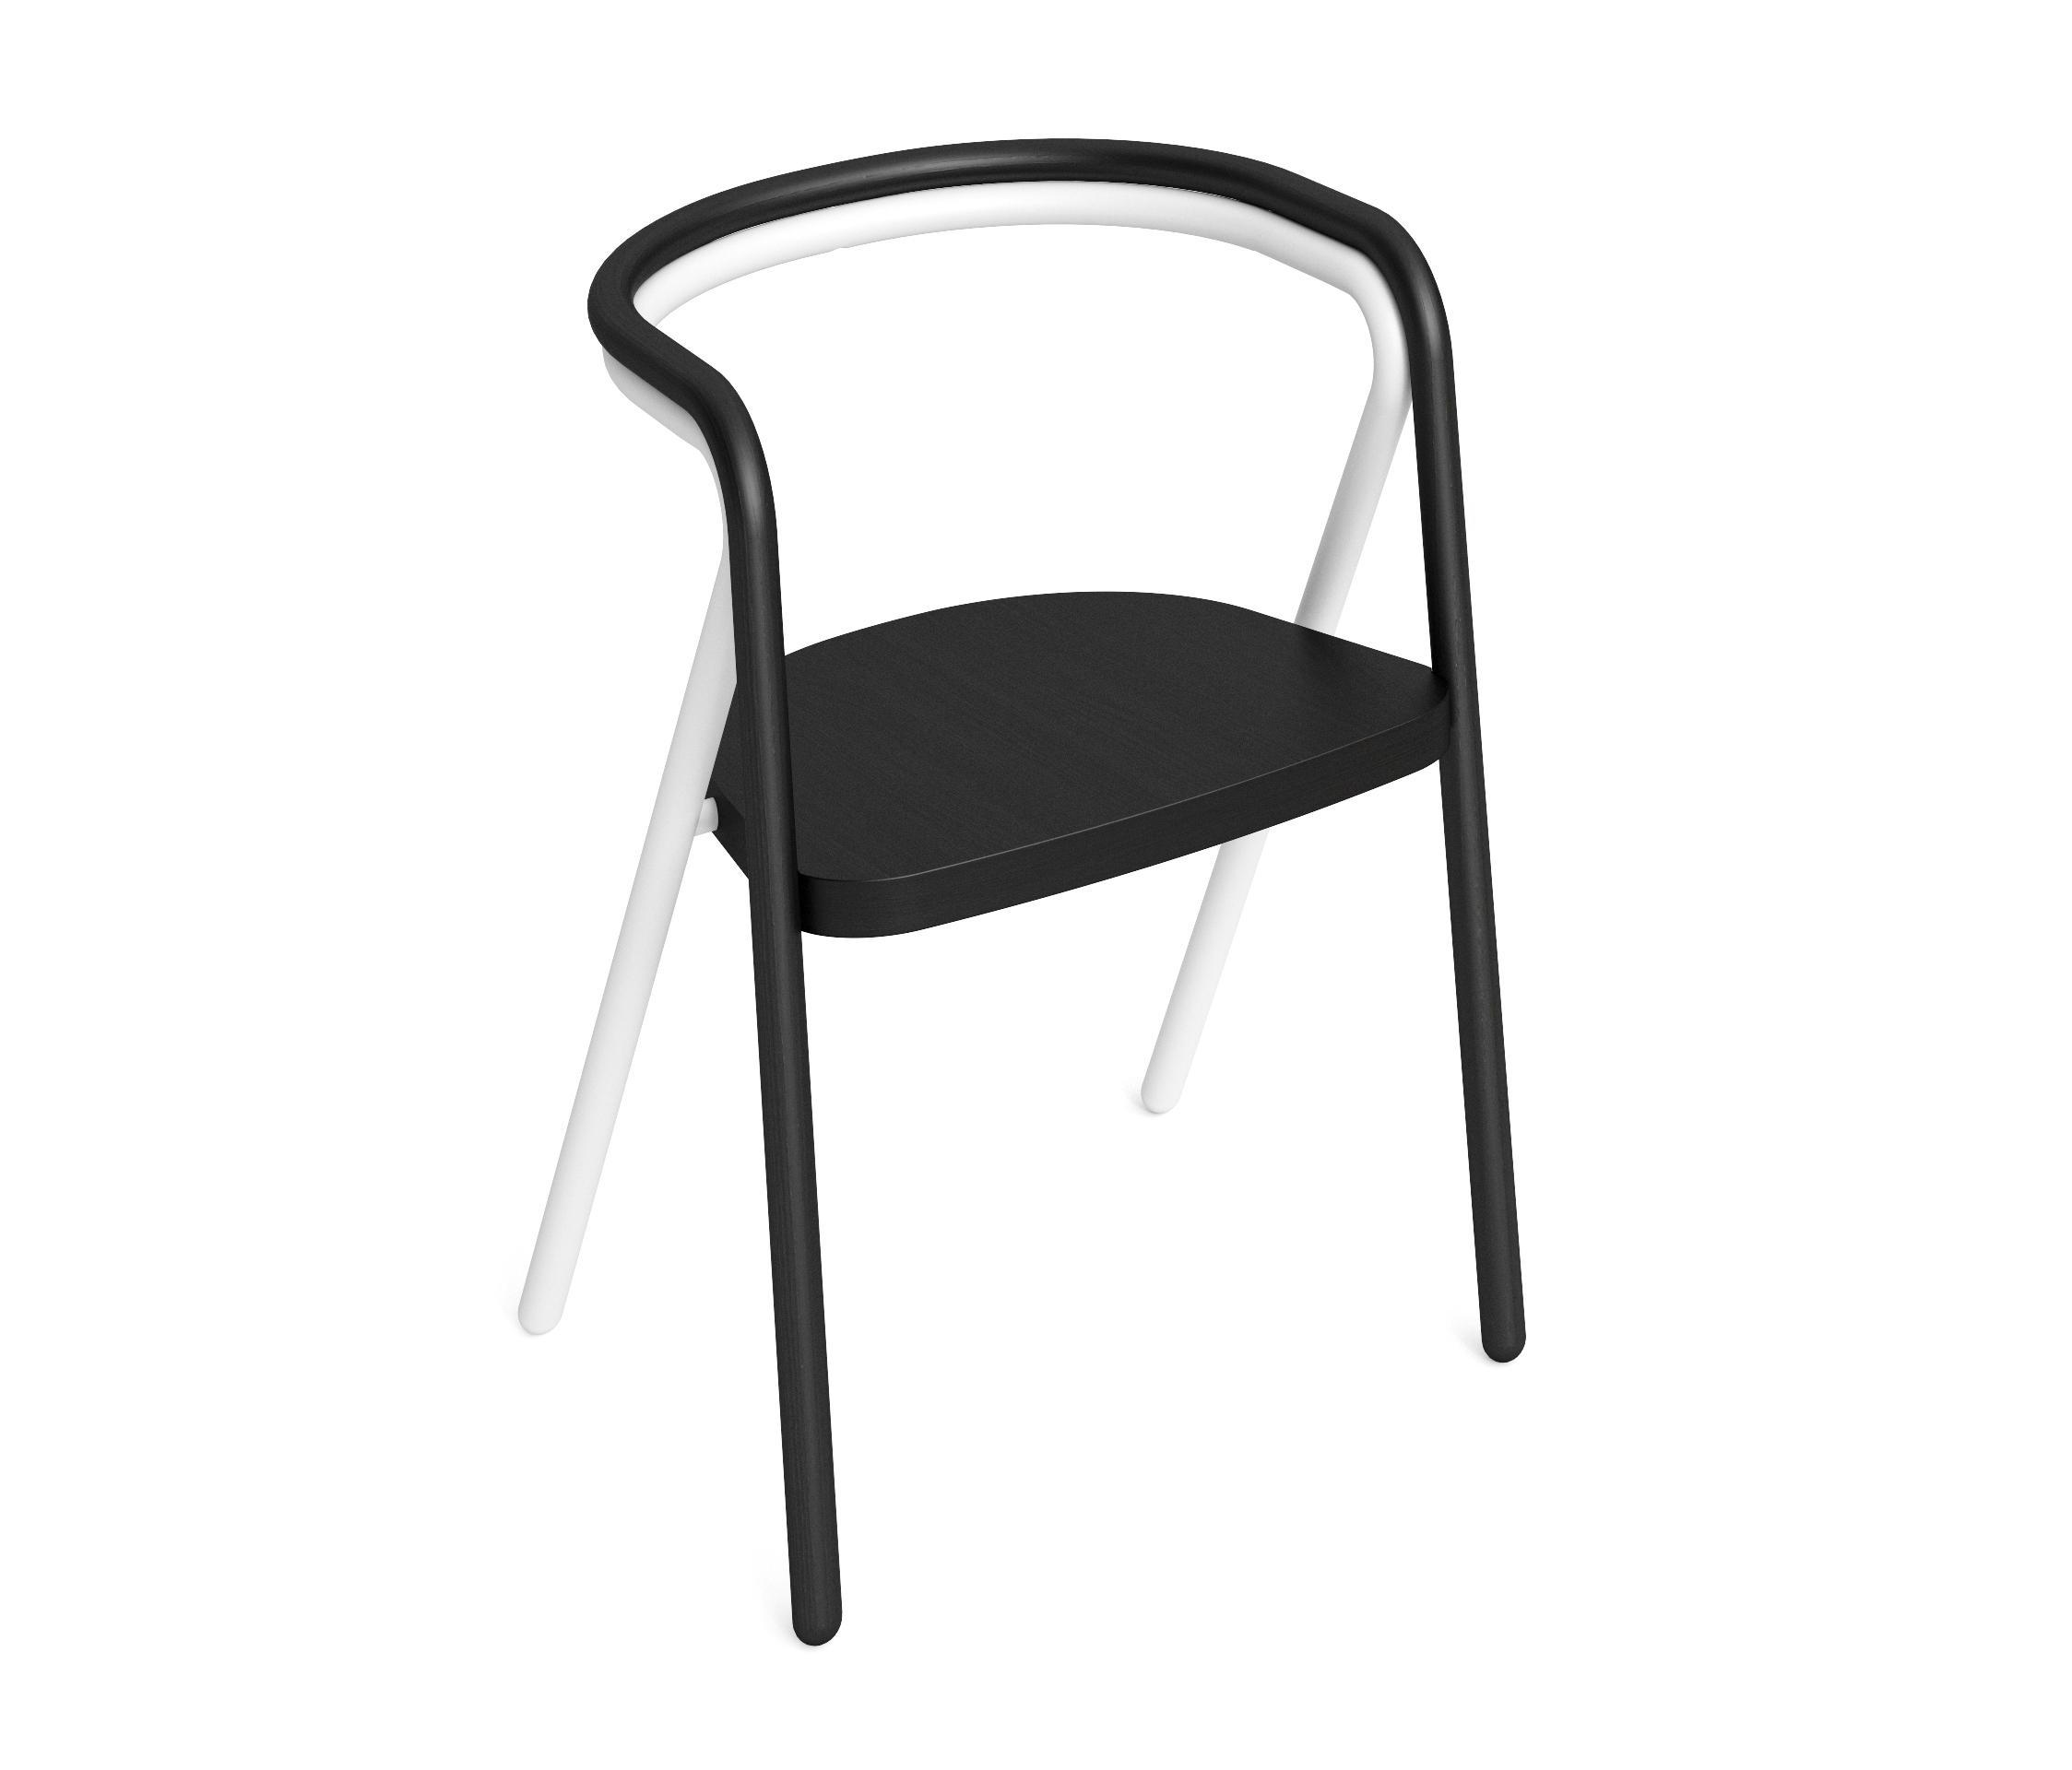 Bakery工作室 Bakery Studio| Chair 2 Chair 2